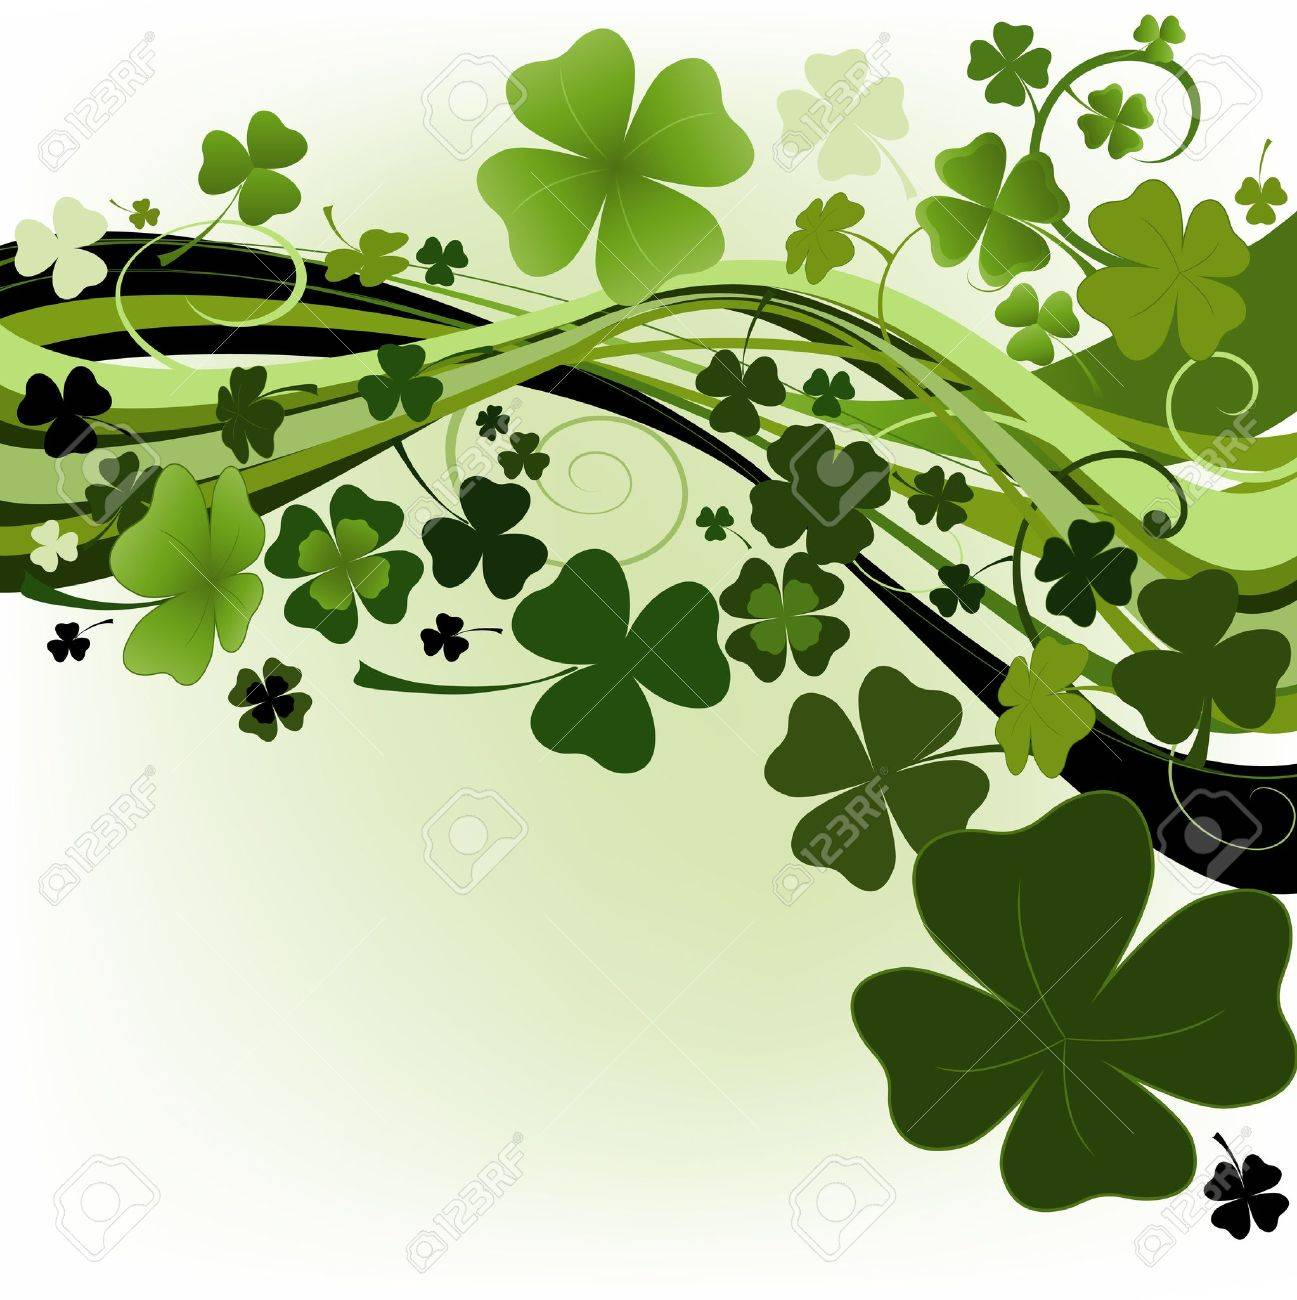 design for St. Patrick's Day Stock Photo - 2606476